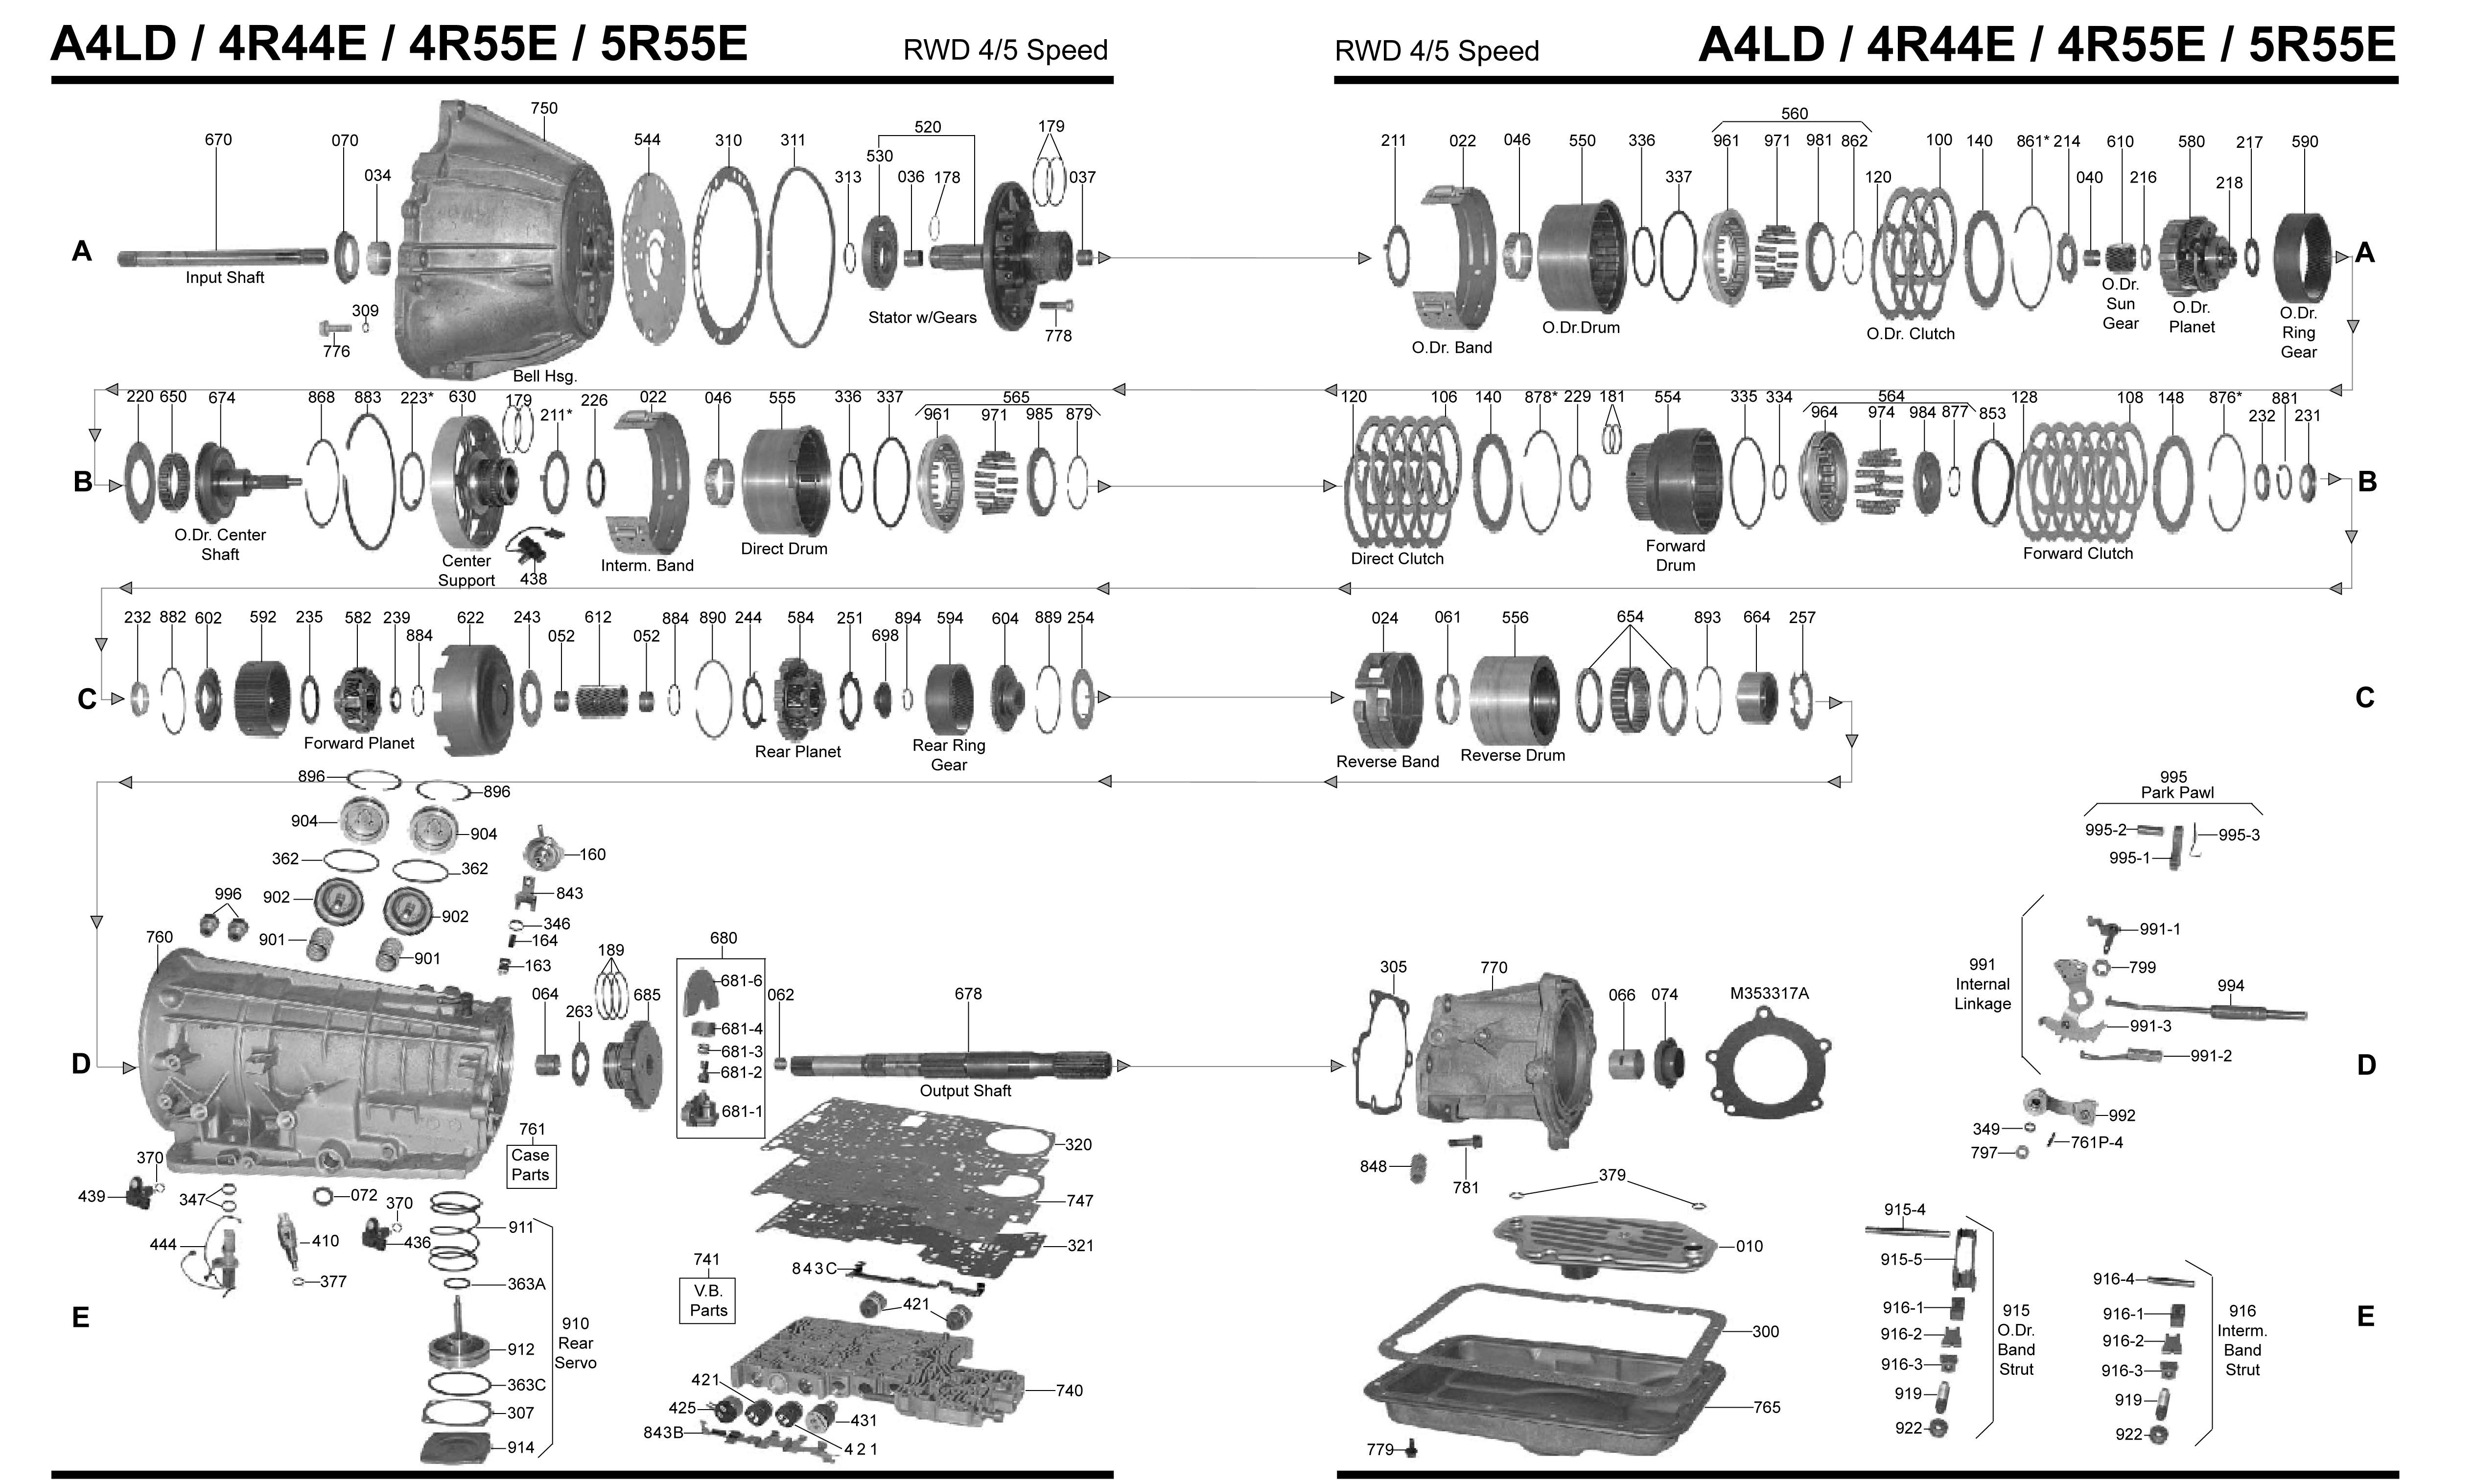 4l80e Transmission Parts Diagram Diagram 4l80e Transmission Parts Diagram Of 4l80e Transmission Parts Diagram